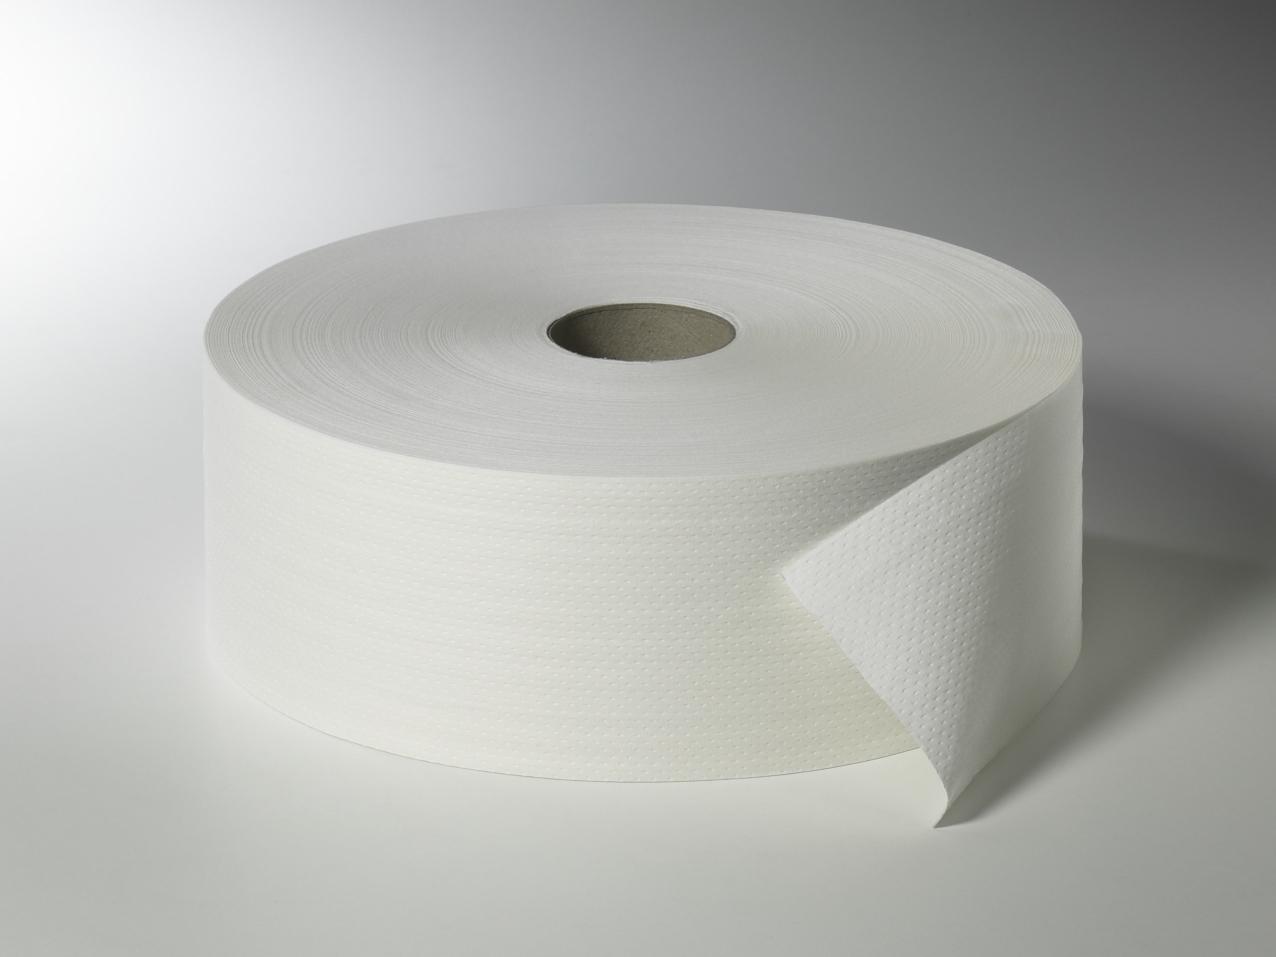 Fripa - Toilettenpapier maxi, 2-lagig, 420 m, nicht perforiert (6 Rl.)